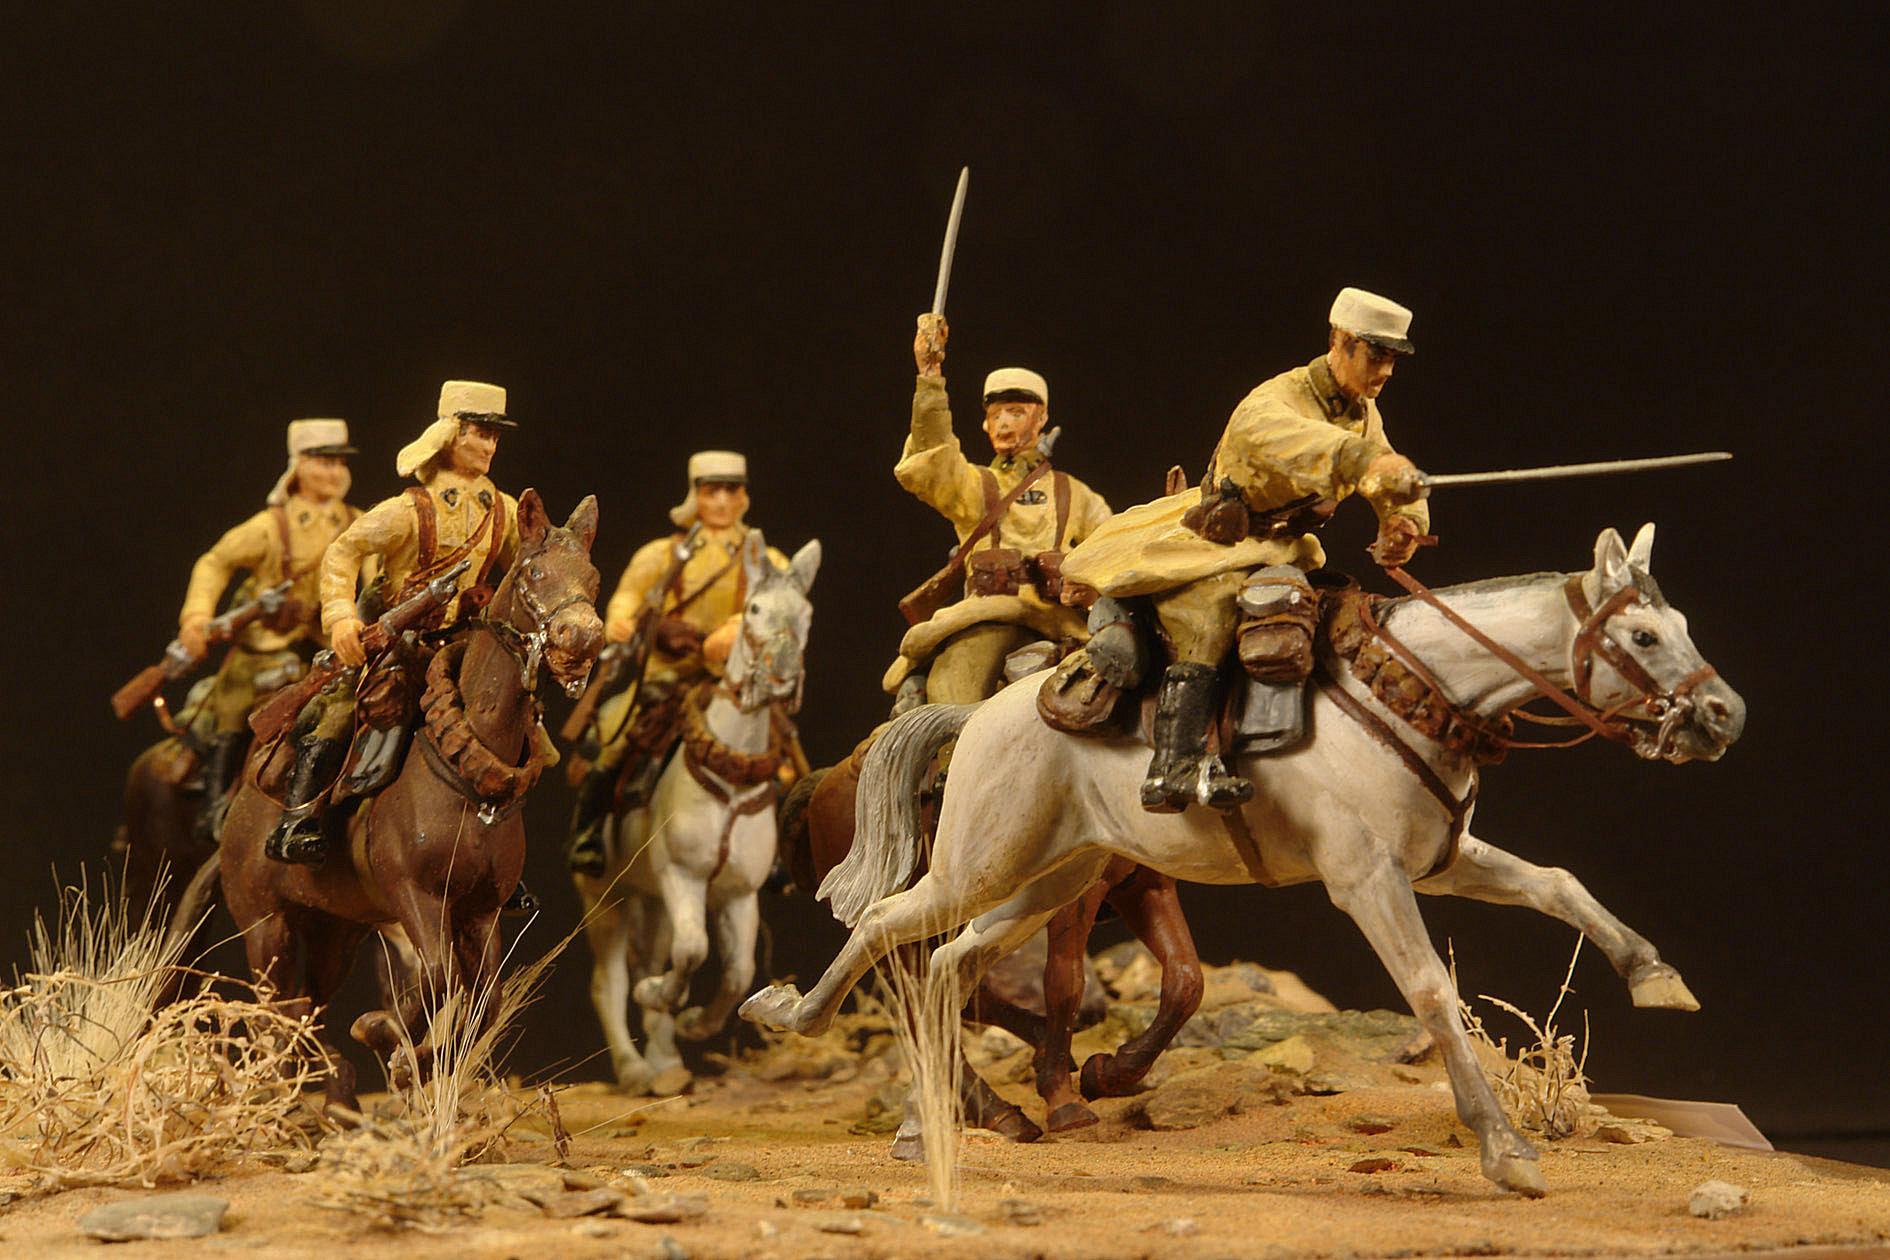 1925-Fransk-kavaleriangreb-i-Marokko-1